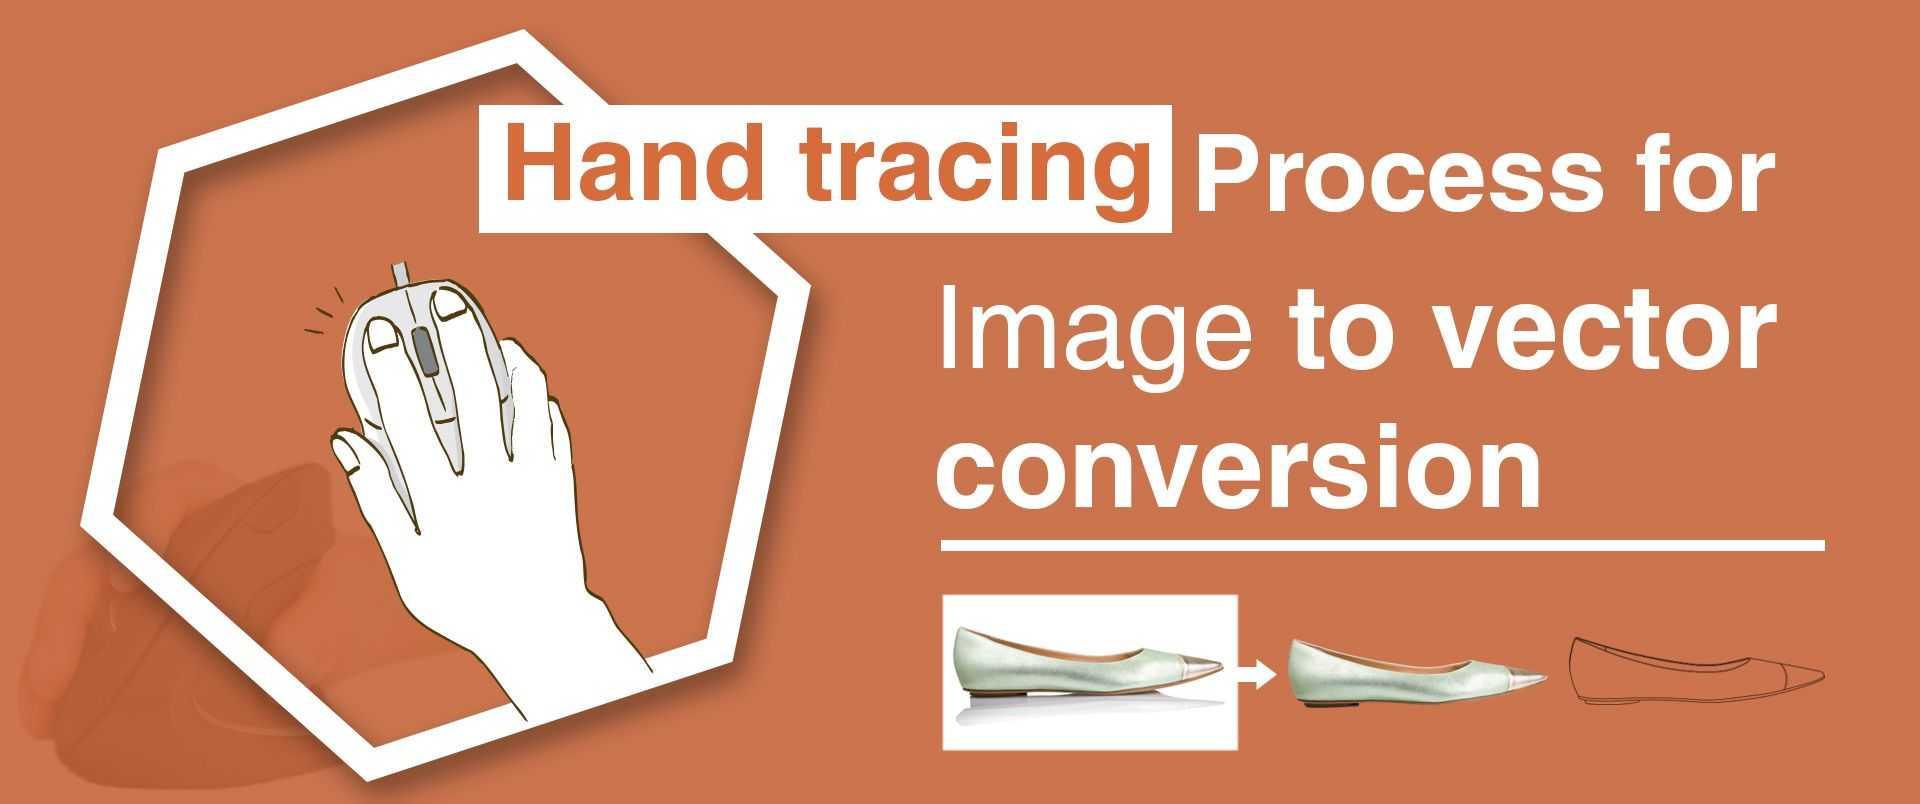 Hand tracing Process